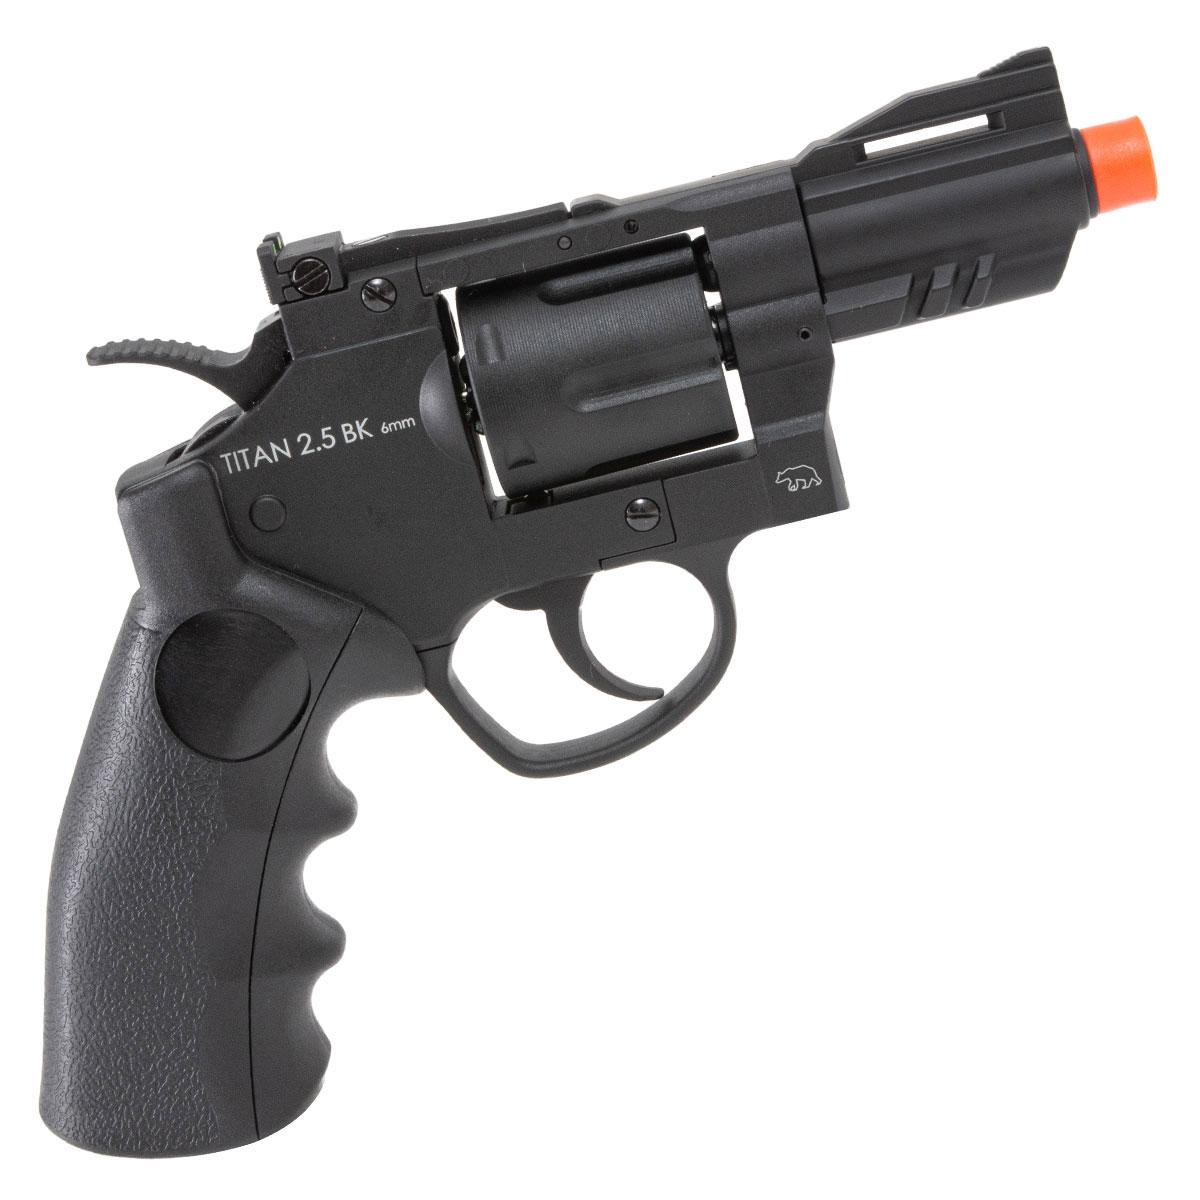 Revolver de Airsoft Titan 2.5 BK QGK a Gás Co2